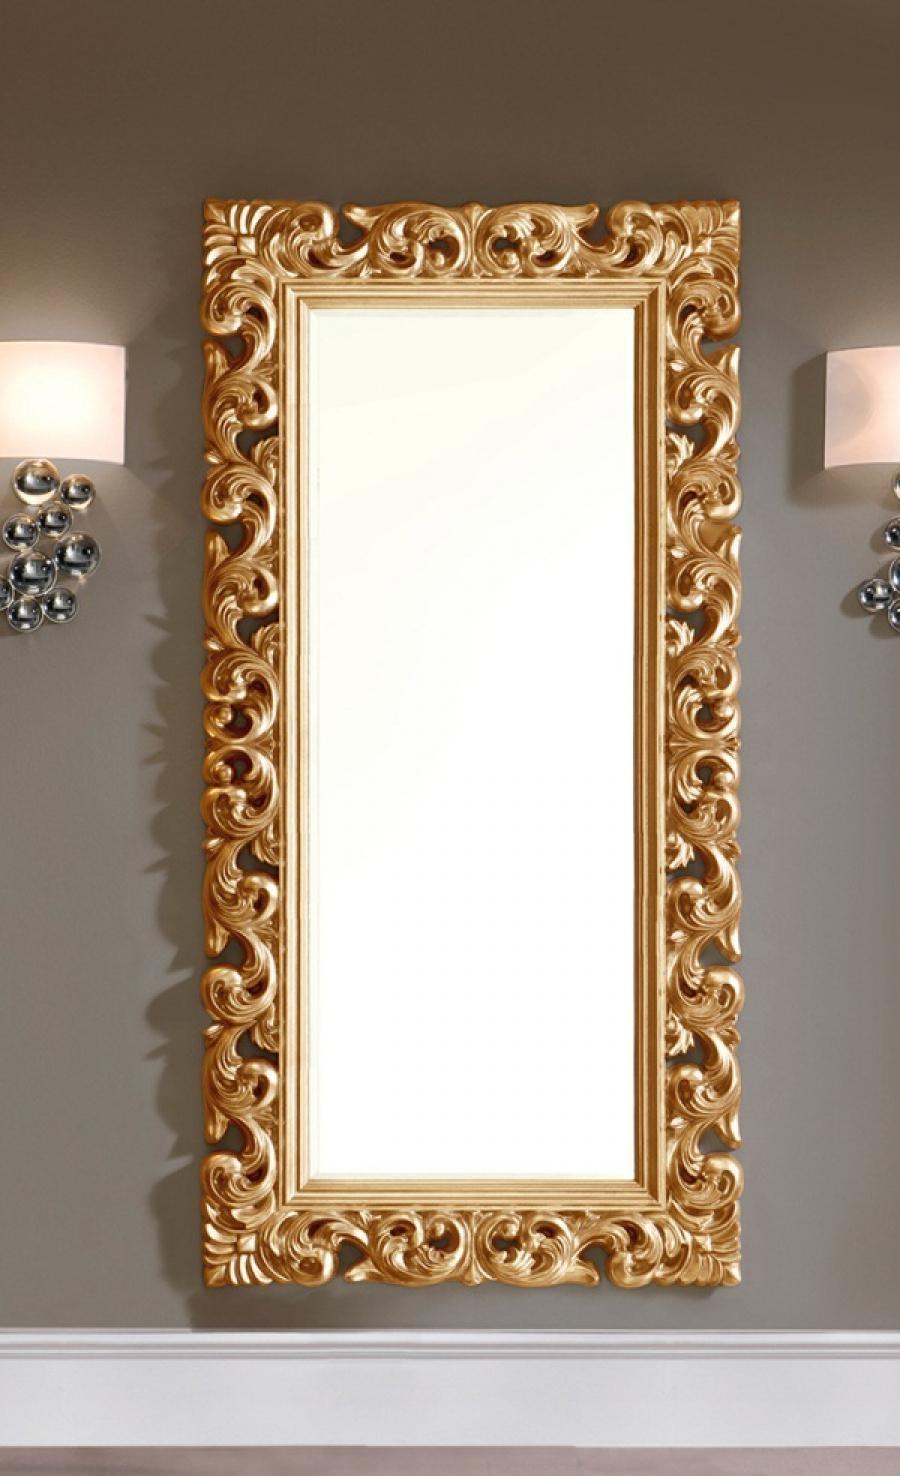 Ornate Mirrors Uk | Shoe800 Throughout Mirrors Ornate (Image 16 of 20)